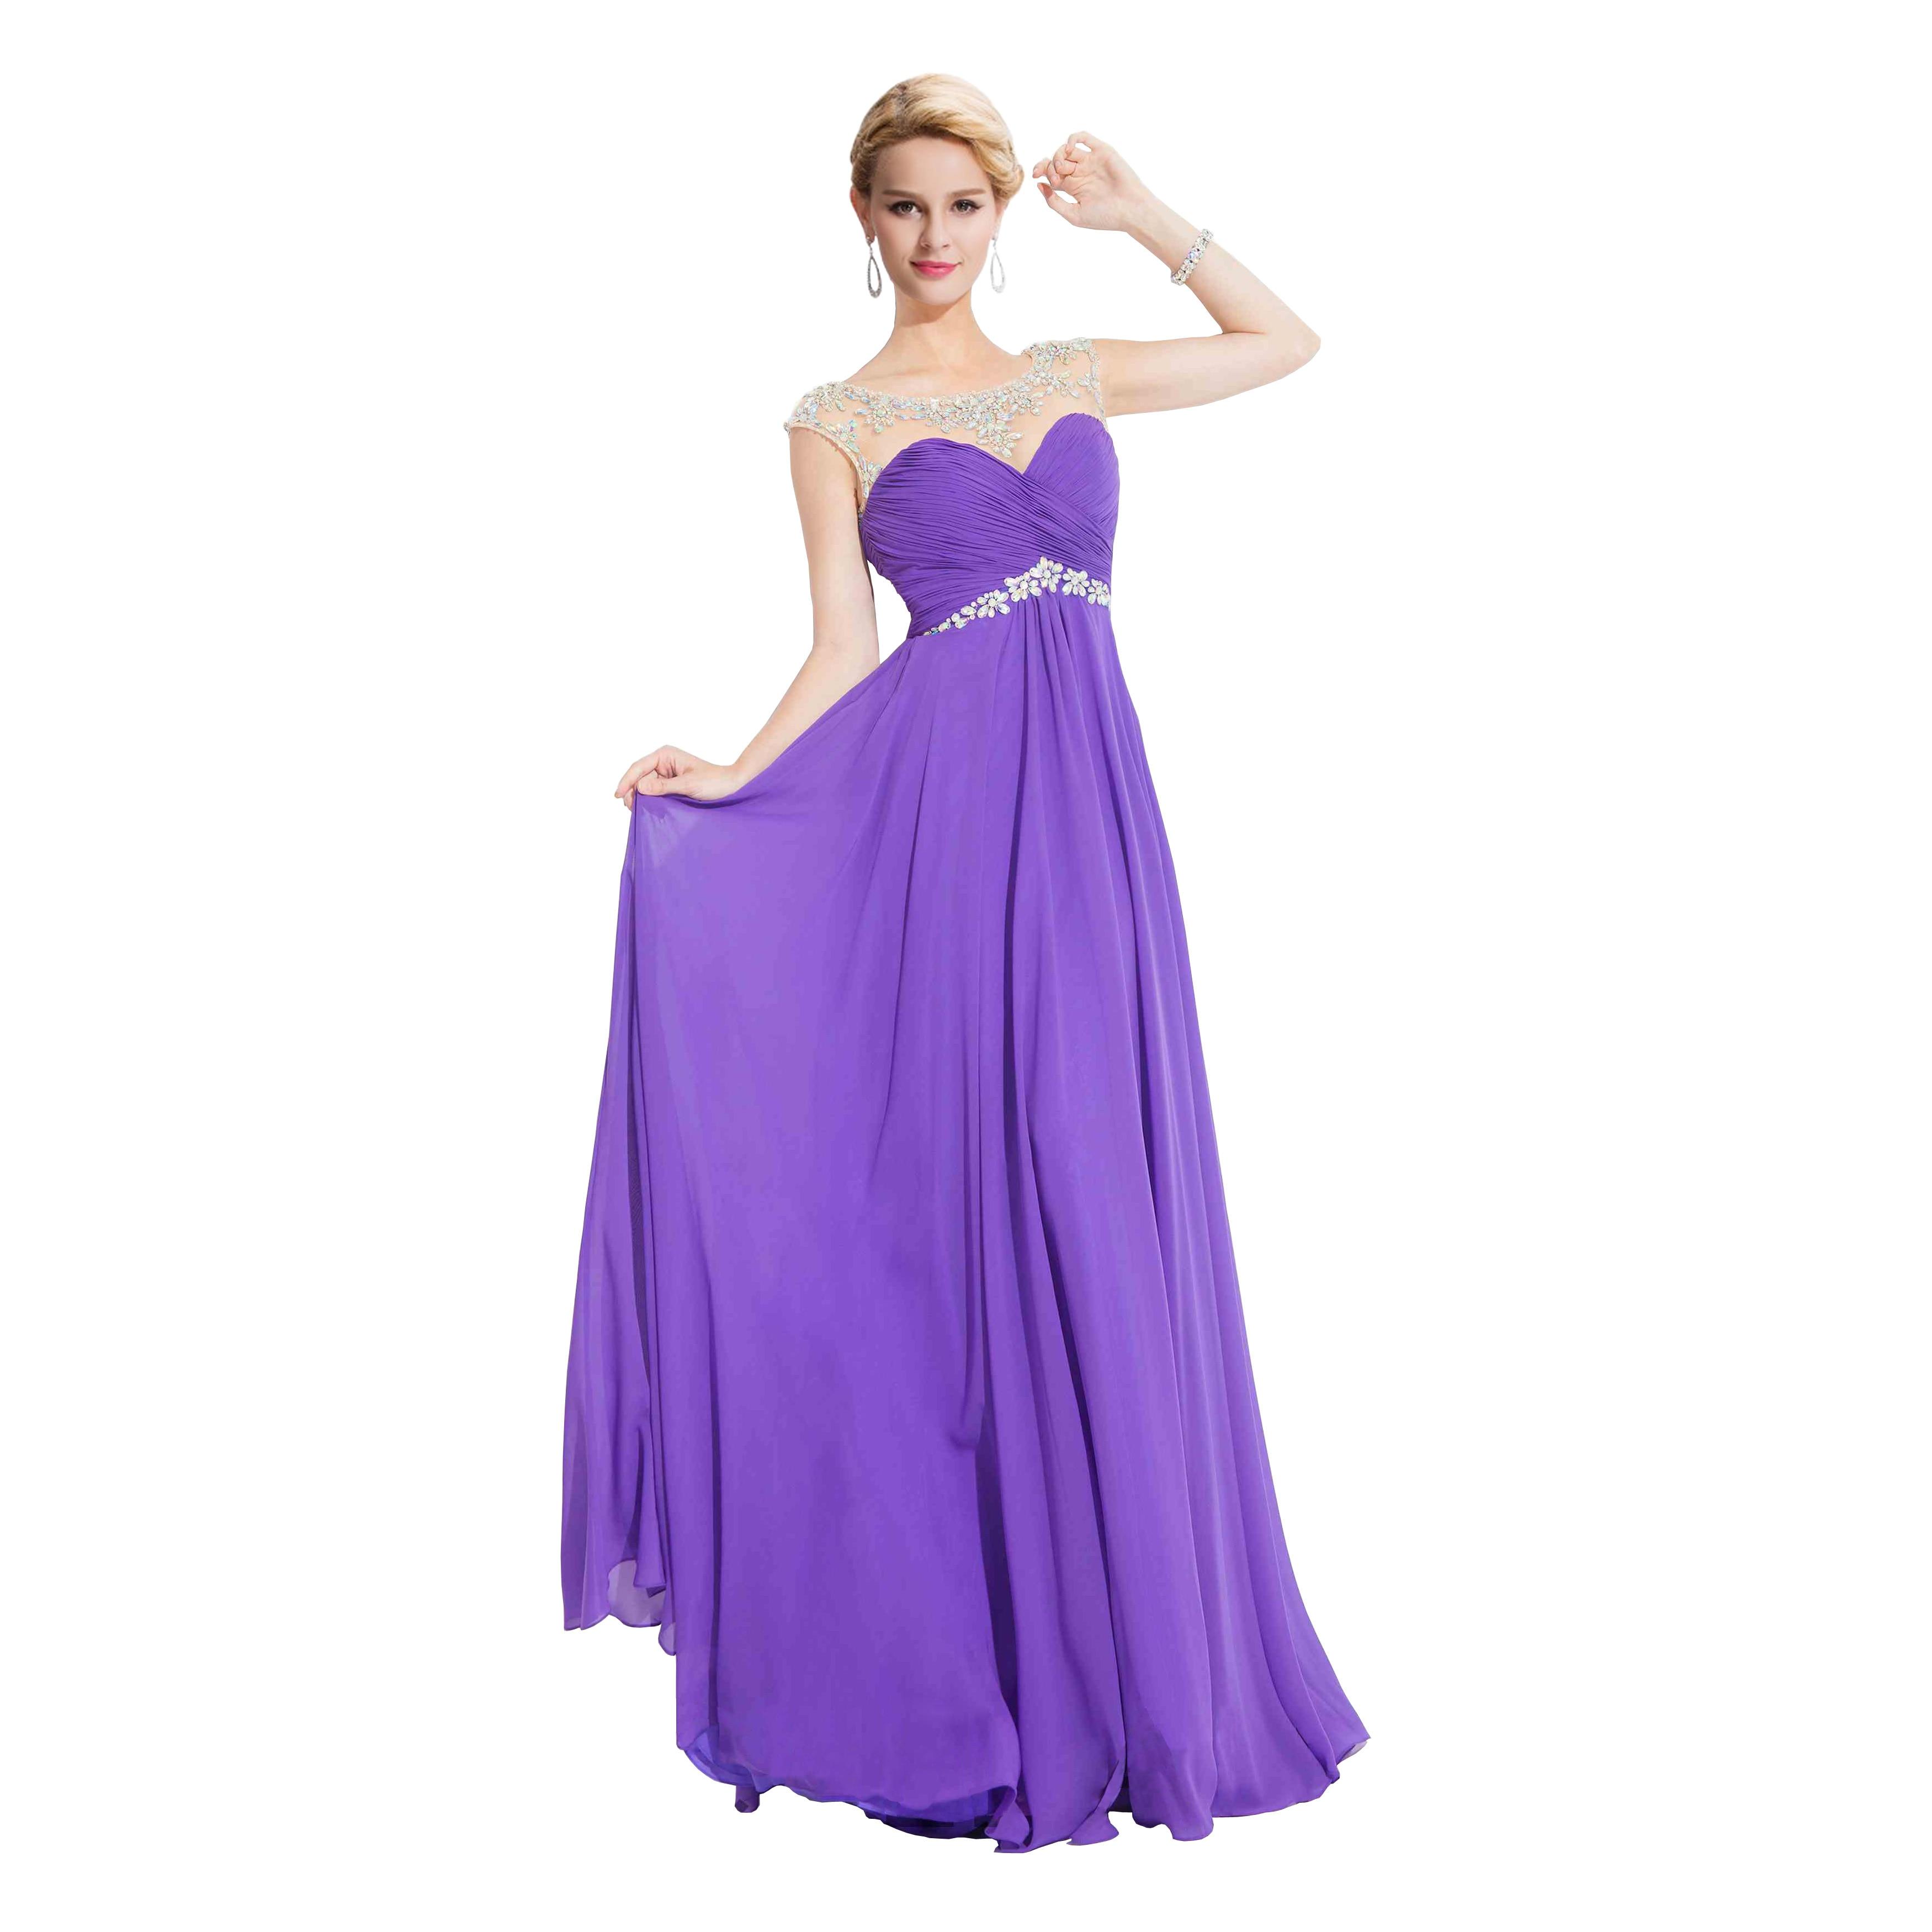 Famoso Vestido De La Dama De Honor Occidental Ideas Ornamento ...